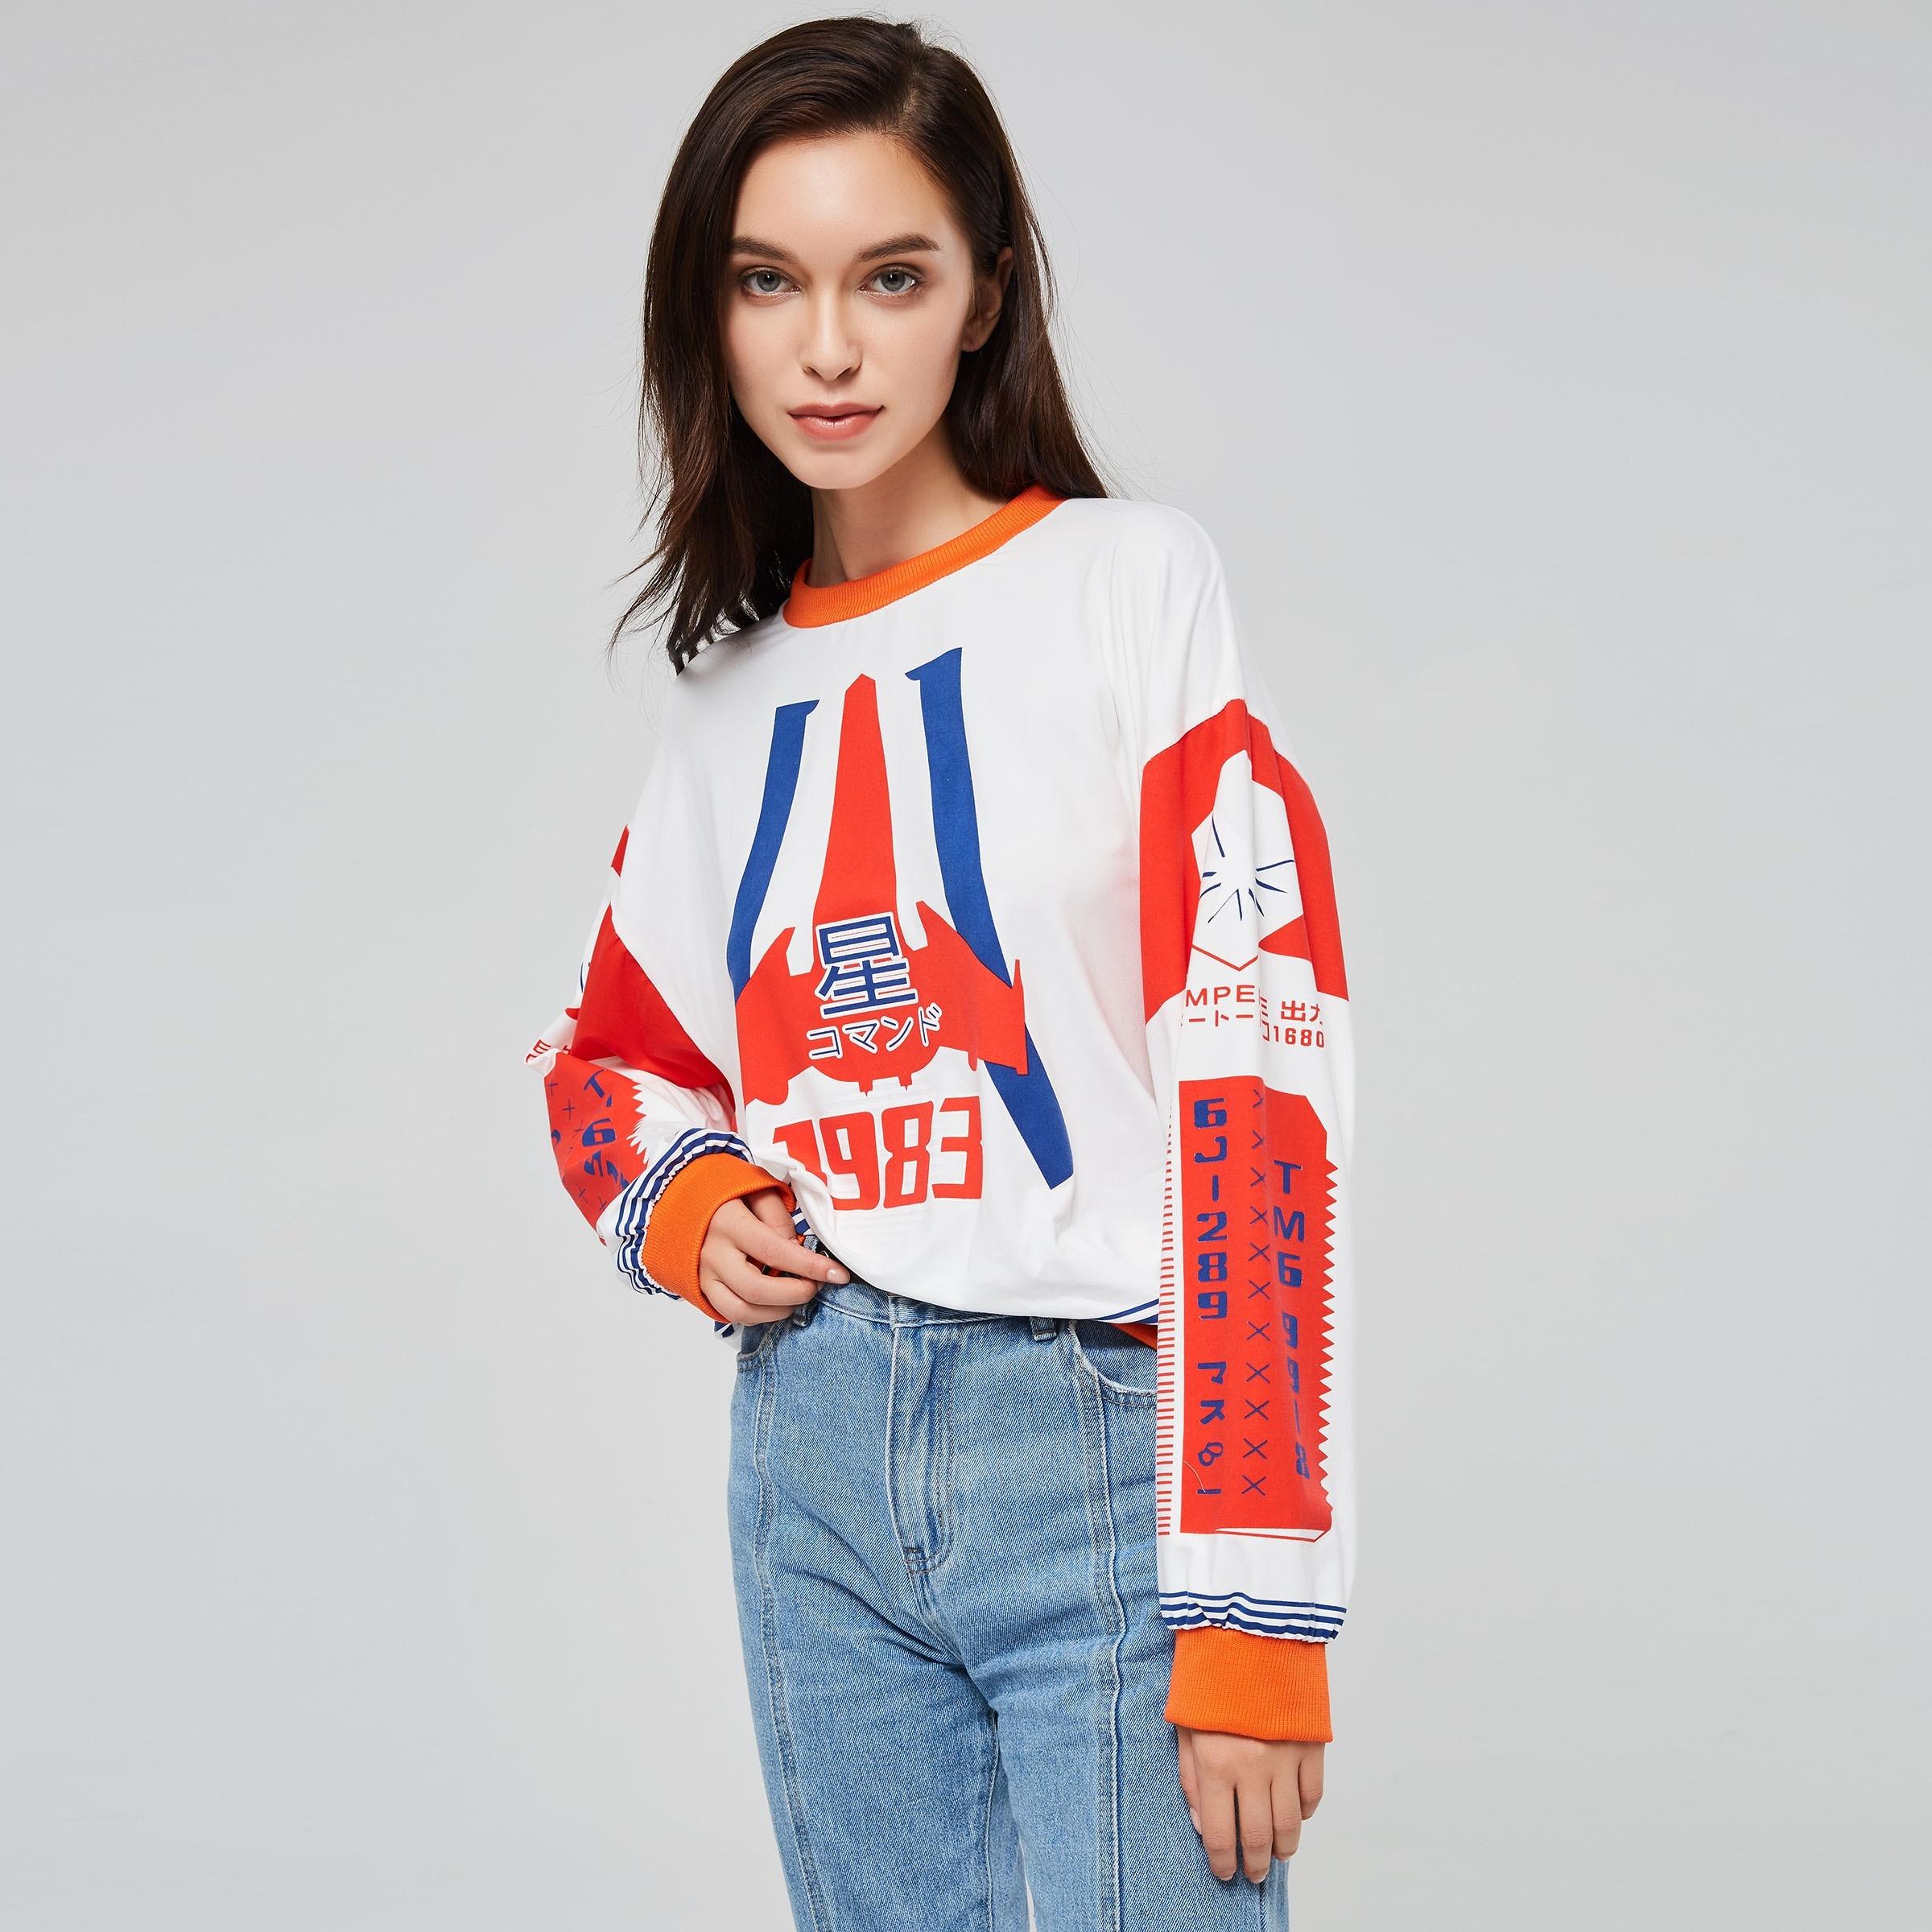 Fashion White Hoodie Sweatshirt Women Autumn 2018 Trendy New Number Red Print Young Girl Sale Streetwear Fitness Hip Hop Hoodies